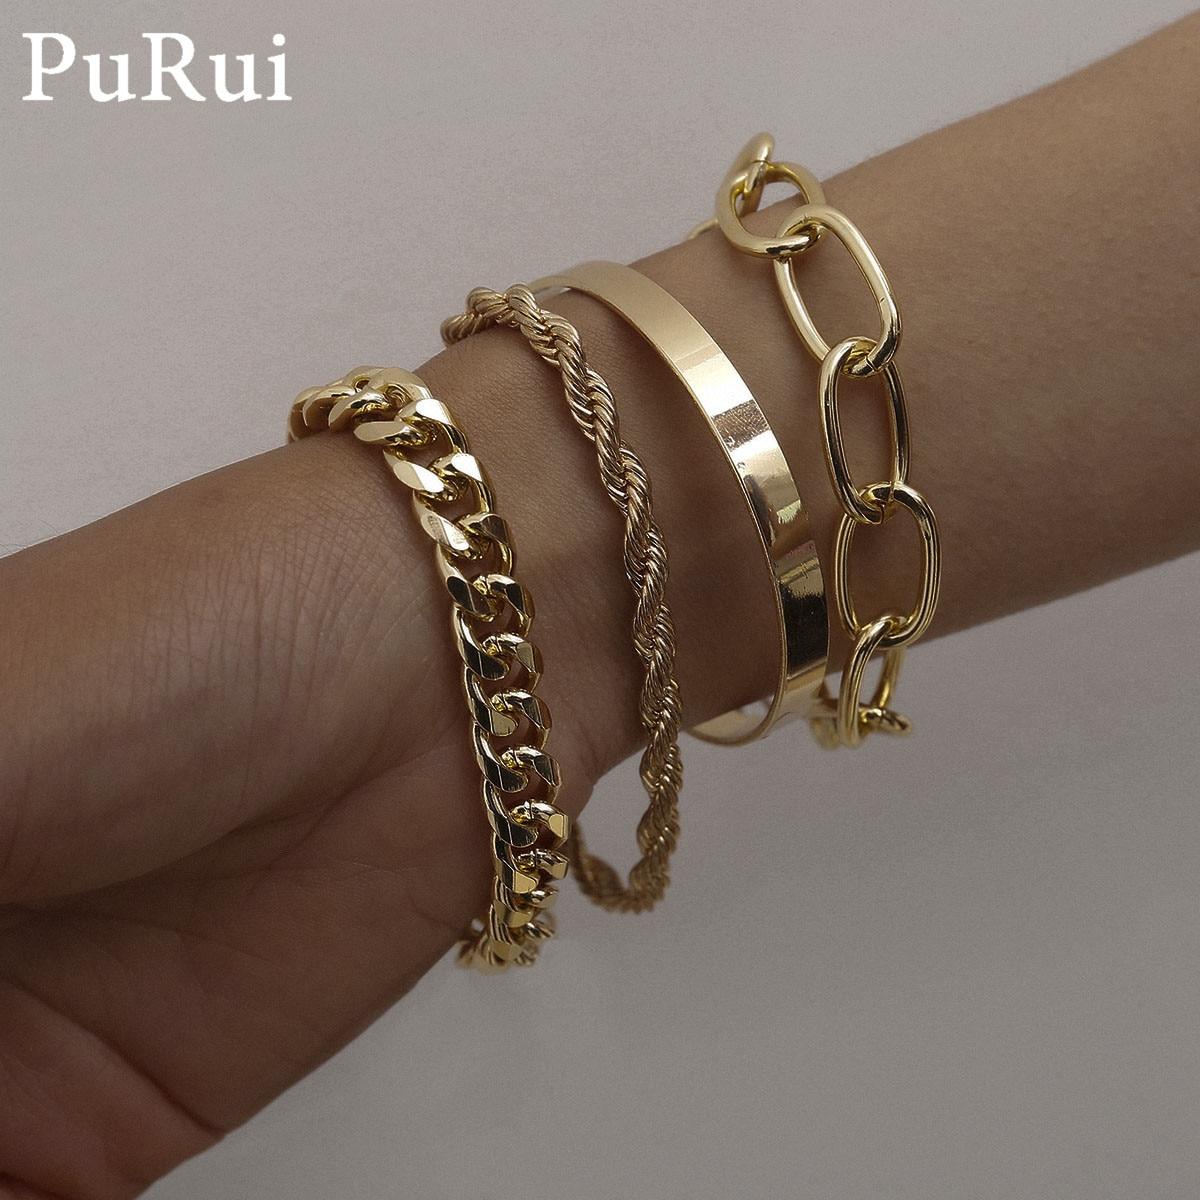 PuRui 4pcs Punk Curb Cuban Chain Bracelets Set for Women Miami Boho Thick Gold Color Charm Bracelets Bangles Fashion Jewelry